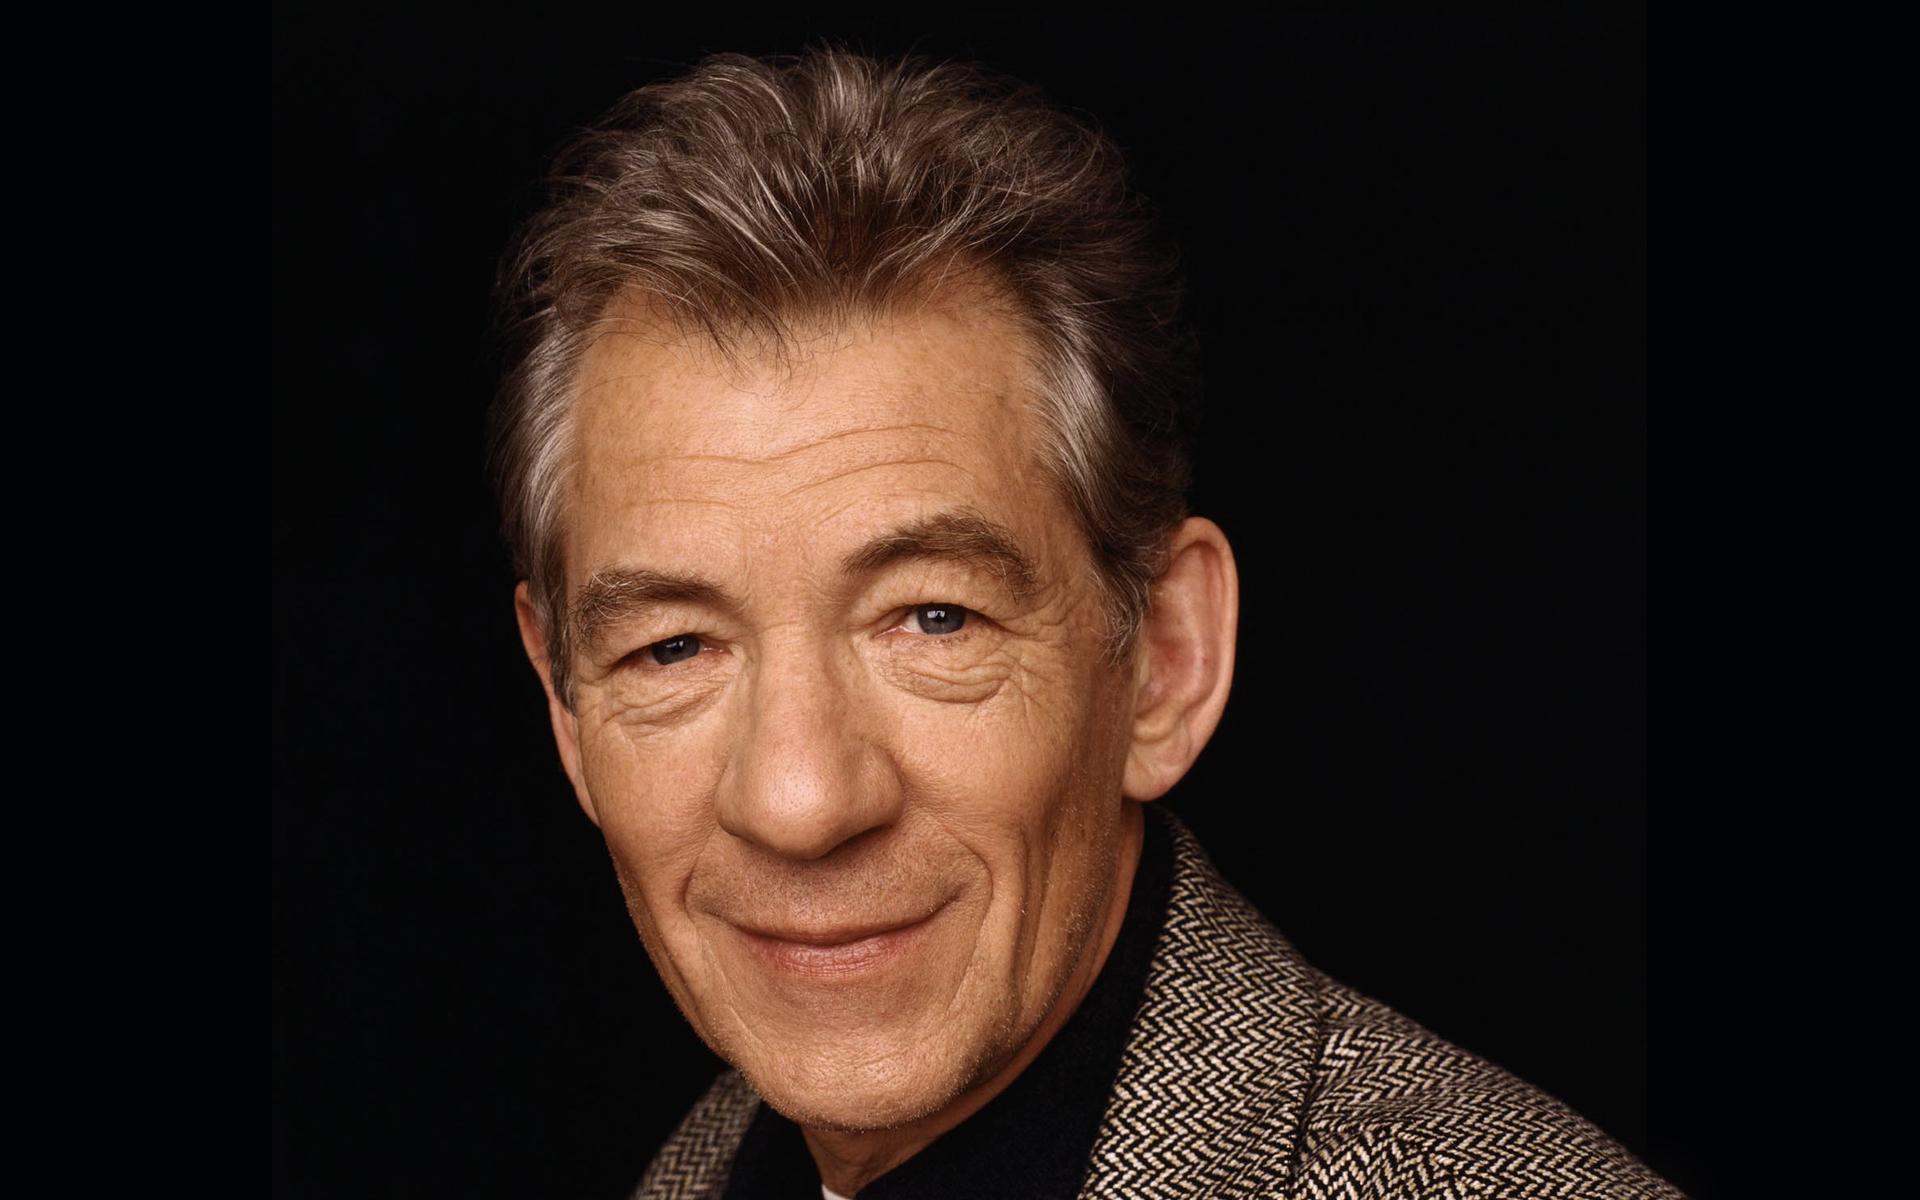 HQ Ian McKellen Wallpapers | File 737.55Kb